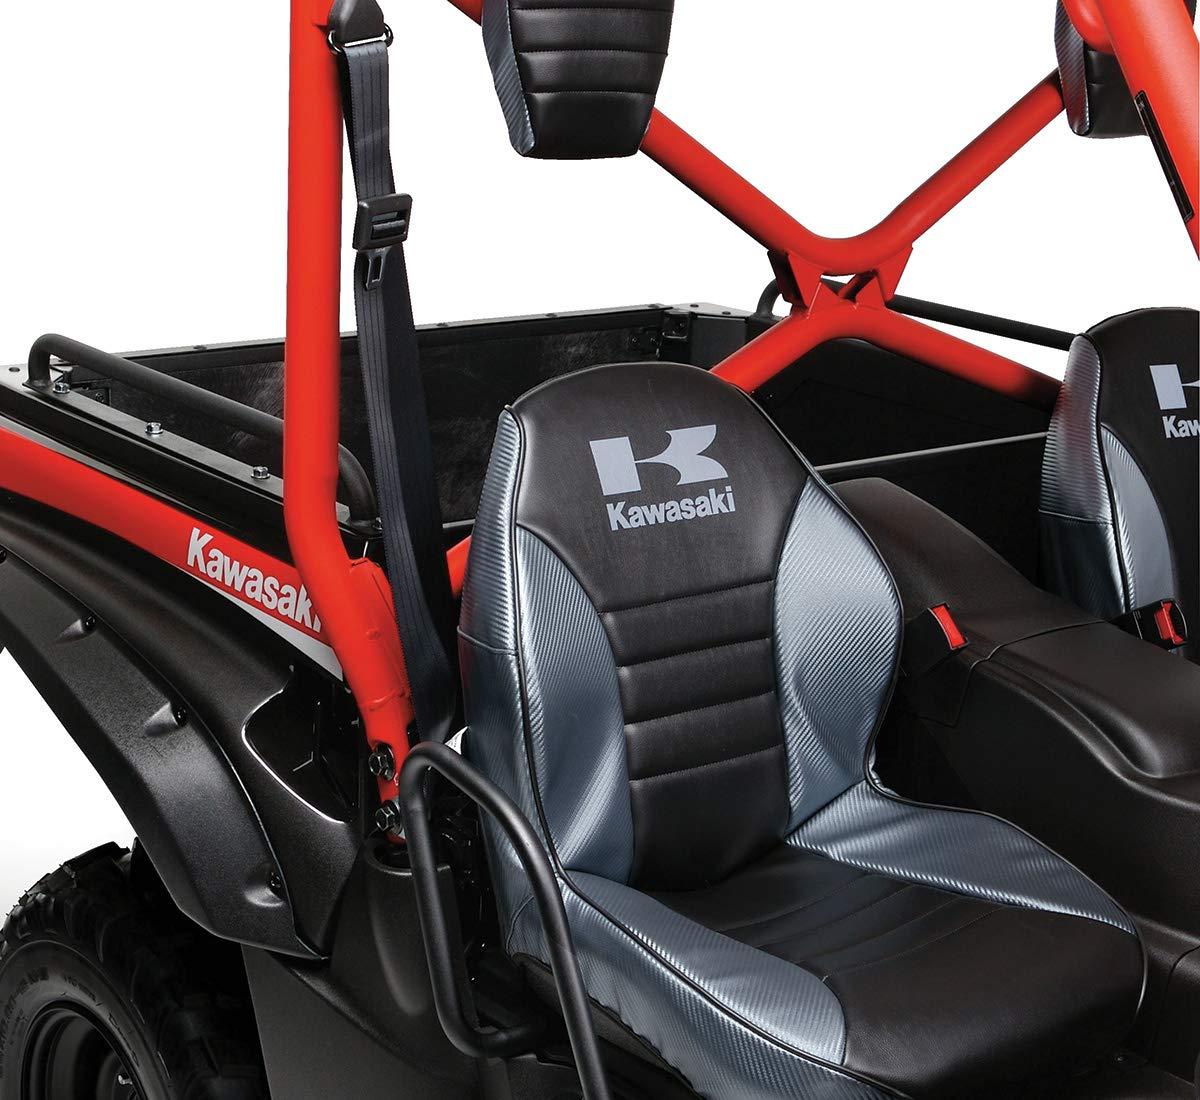 Awe Inspiring Kawasaki Tx750 004T Seat Cover Evergreenethics Interior Chair Design Evergreenethicsorg